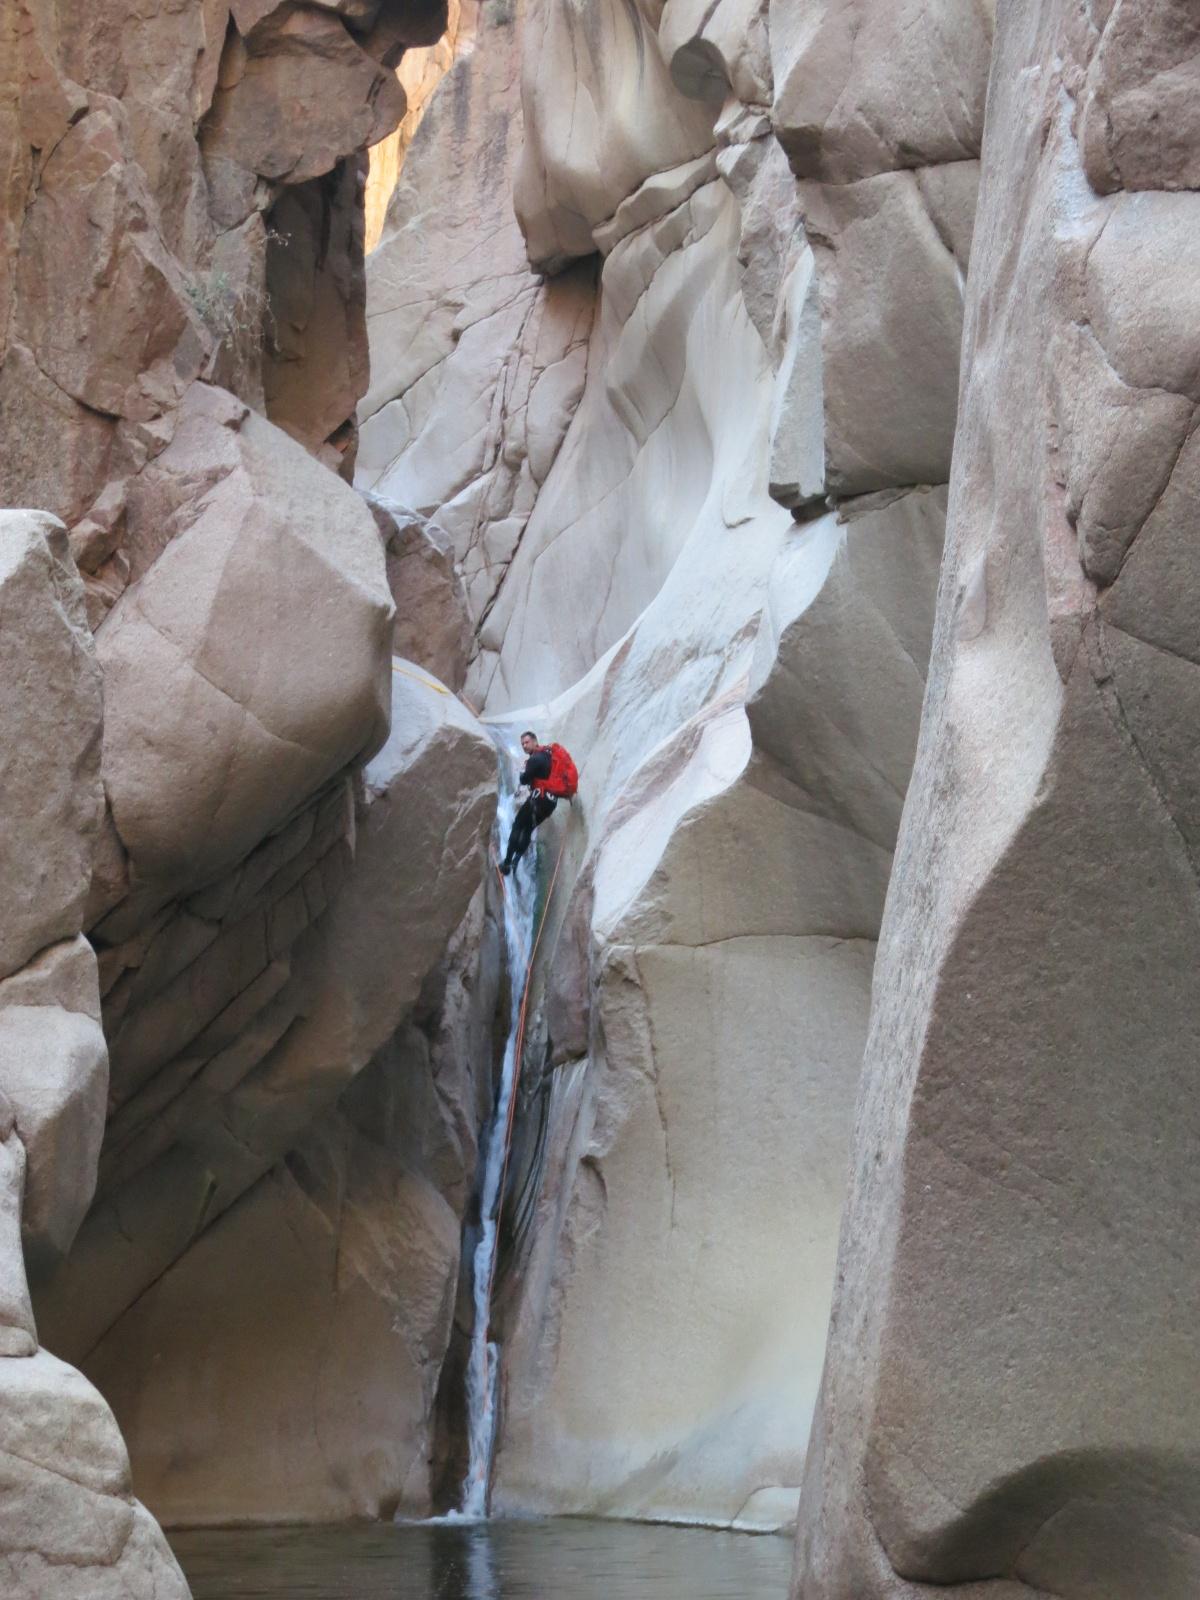 Salome Jug Arizona Canyoneering